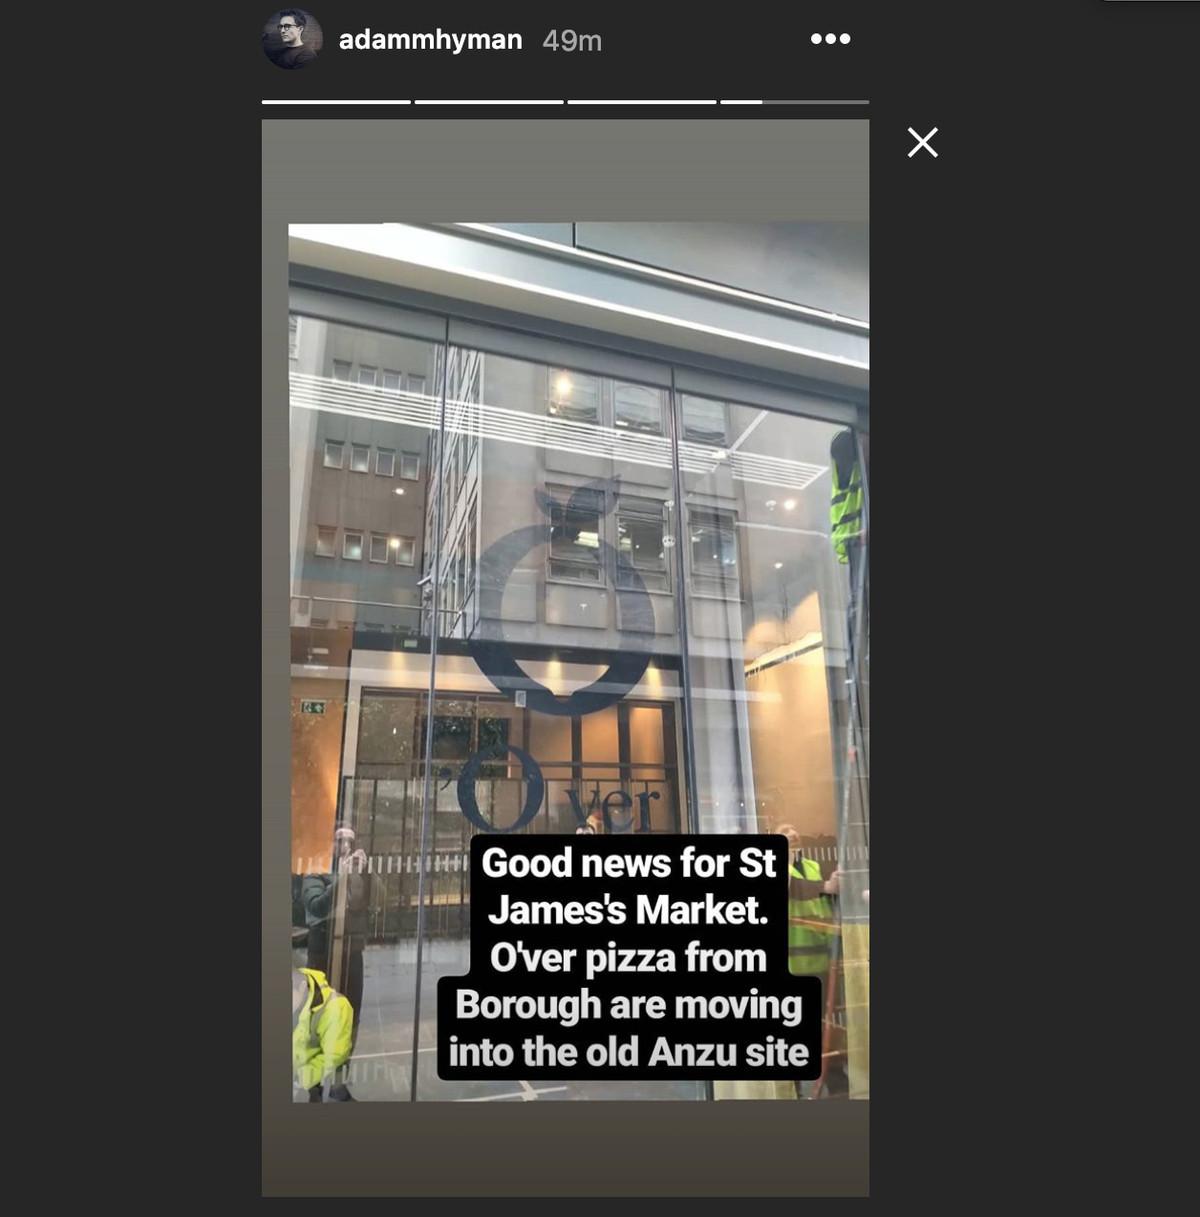 Neapolitan pizzeria O'Ver will replace Tonkotsu's ramen on St. James's Market